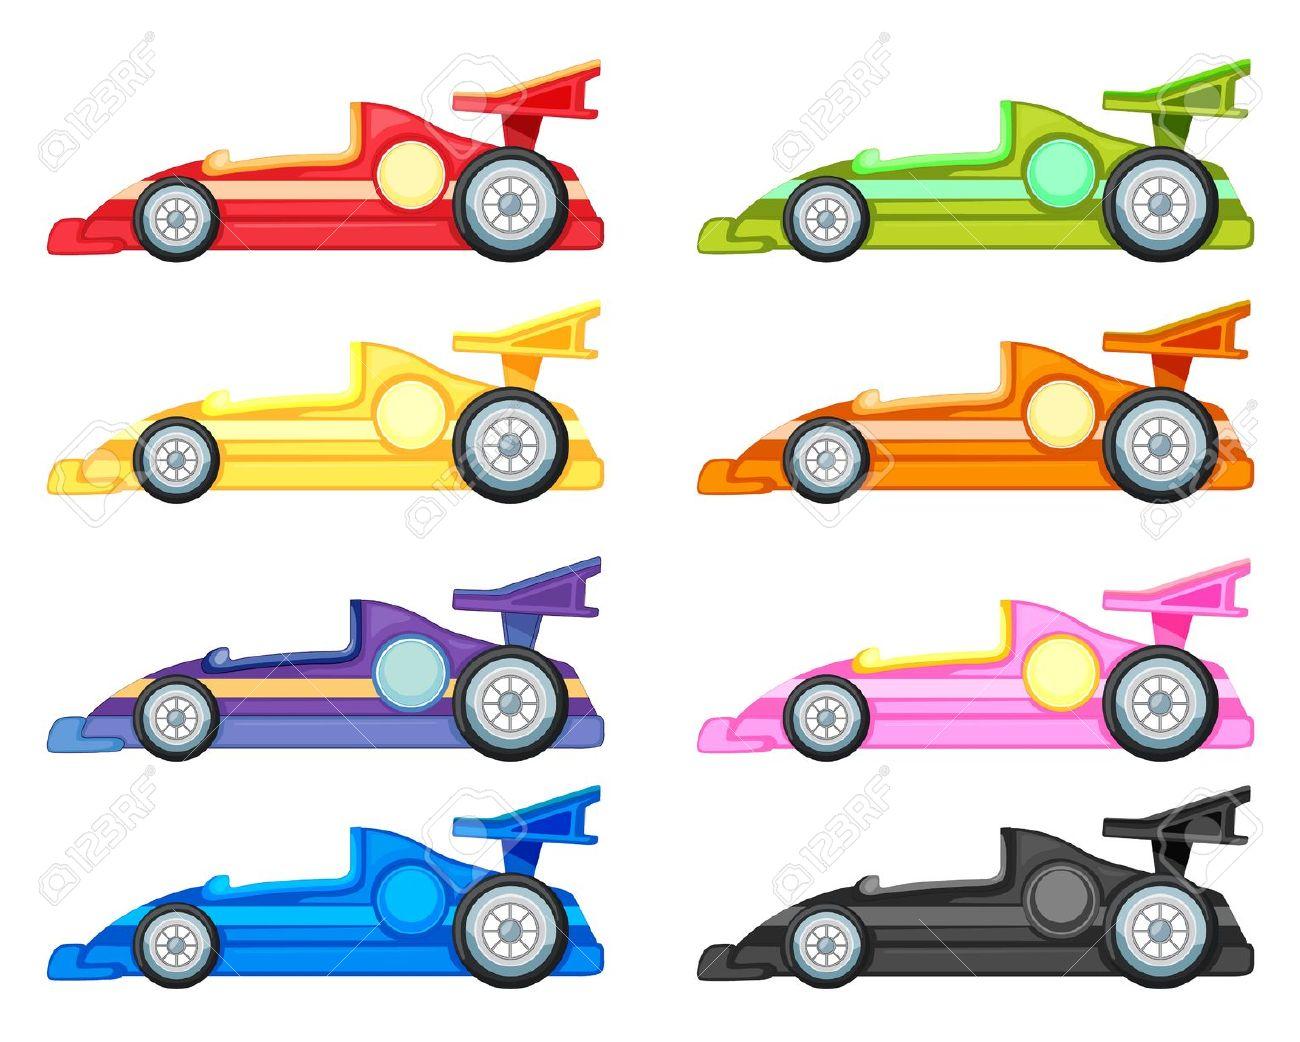 Winning clipart racing car Car clipart 2 free car